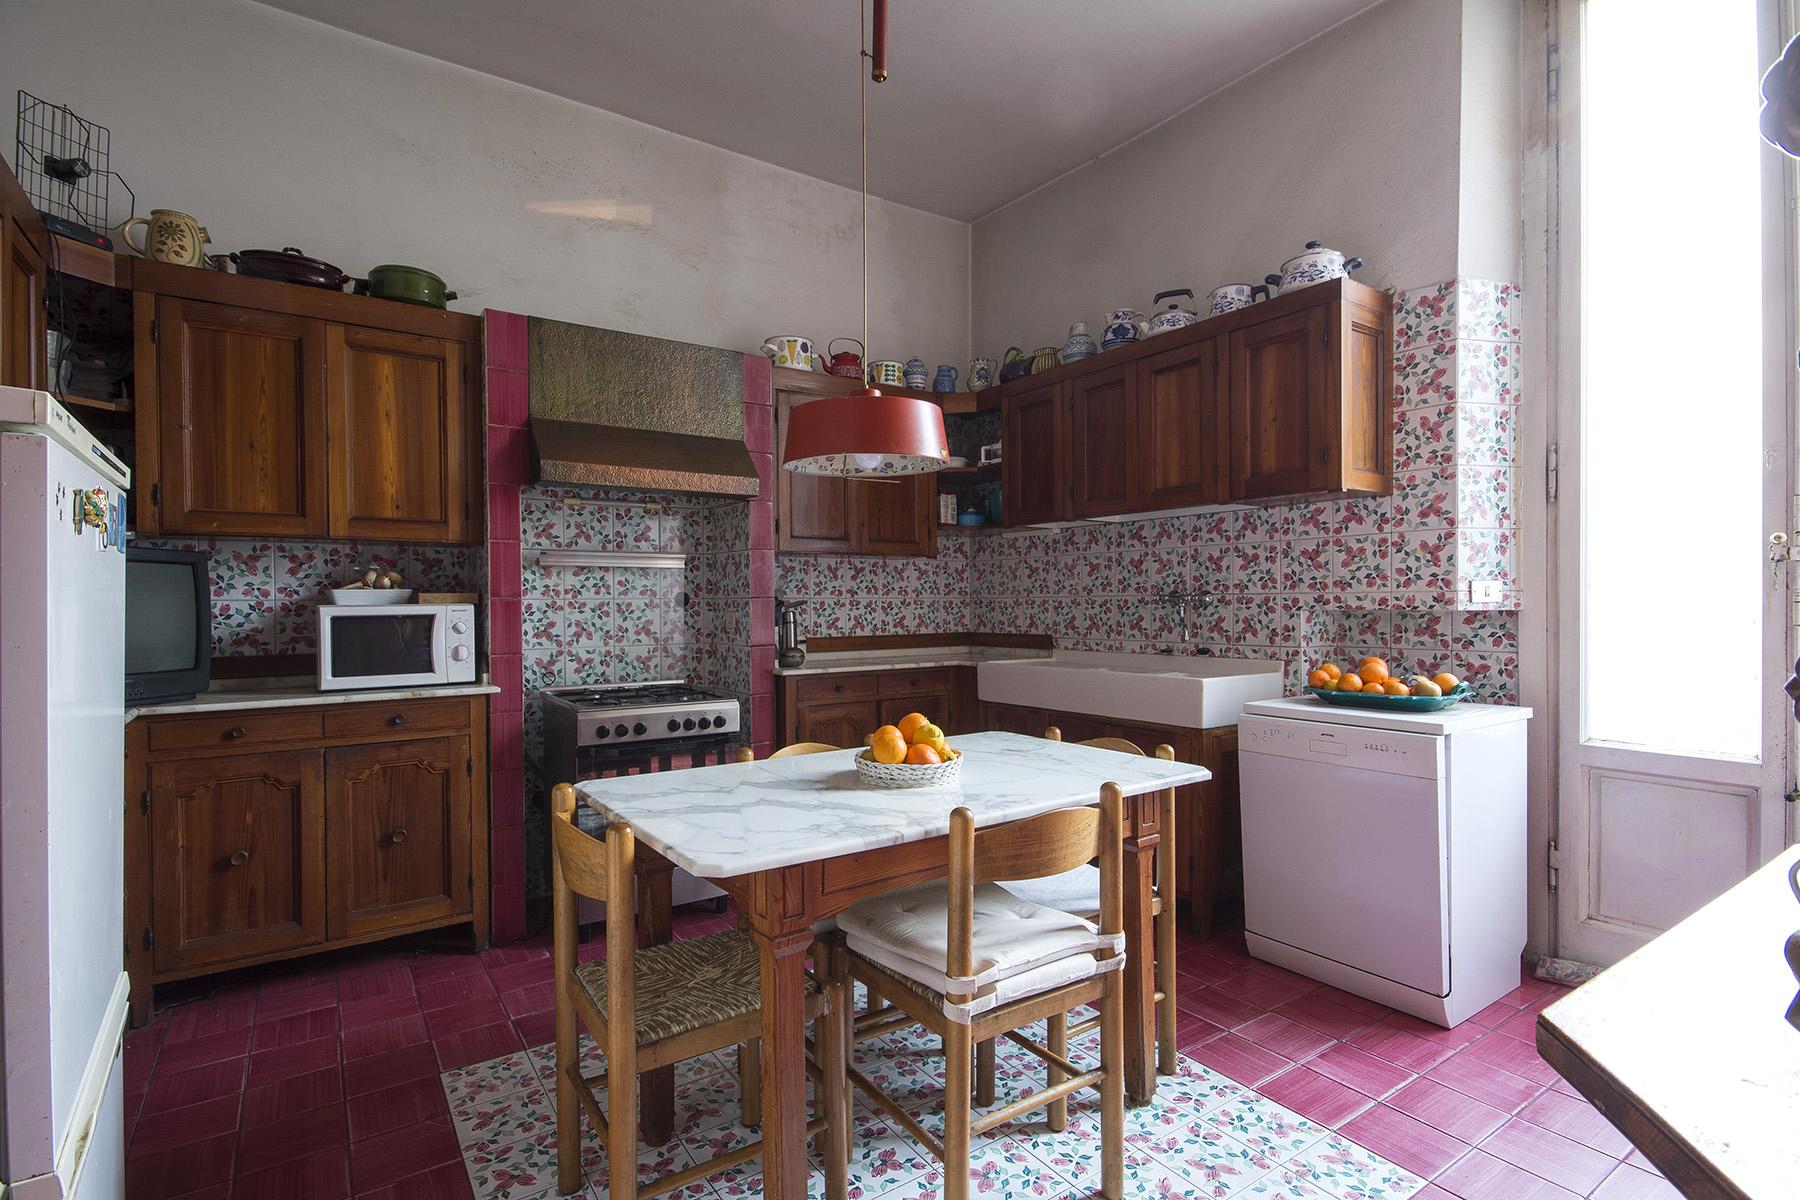 Attico in Vendita a Firenze: 5 locali, 400 mq - Foto 8